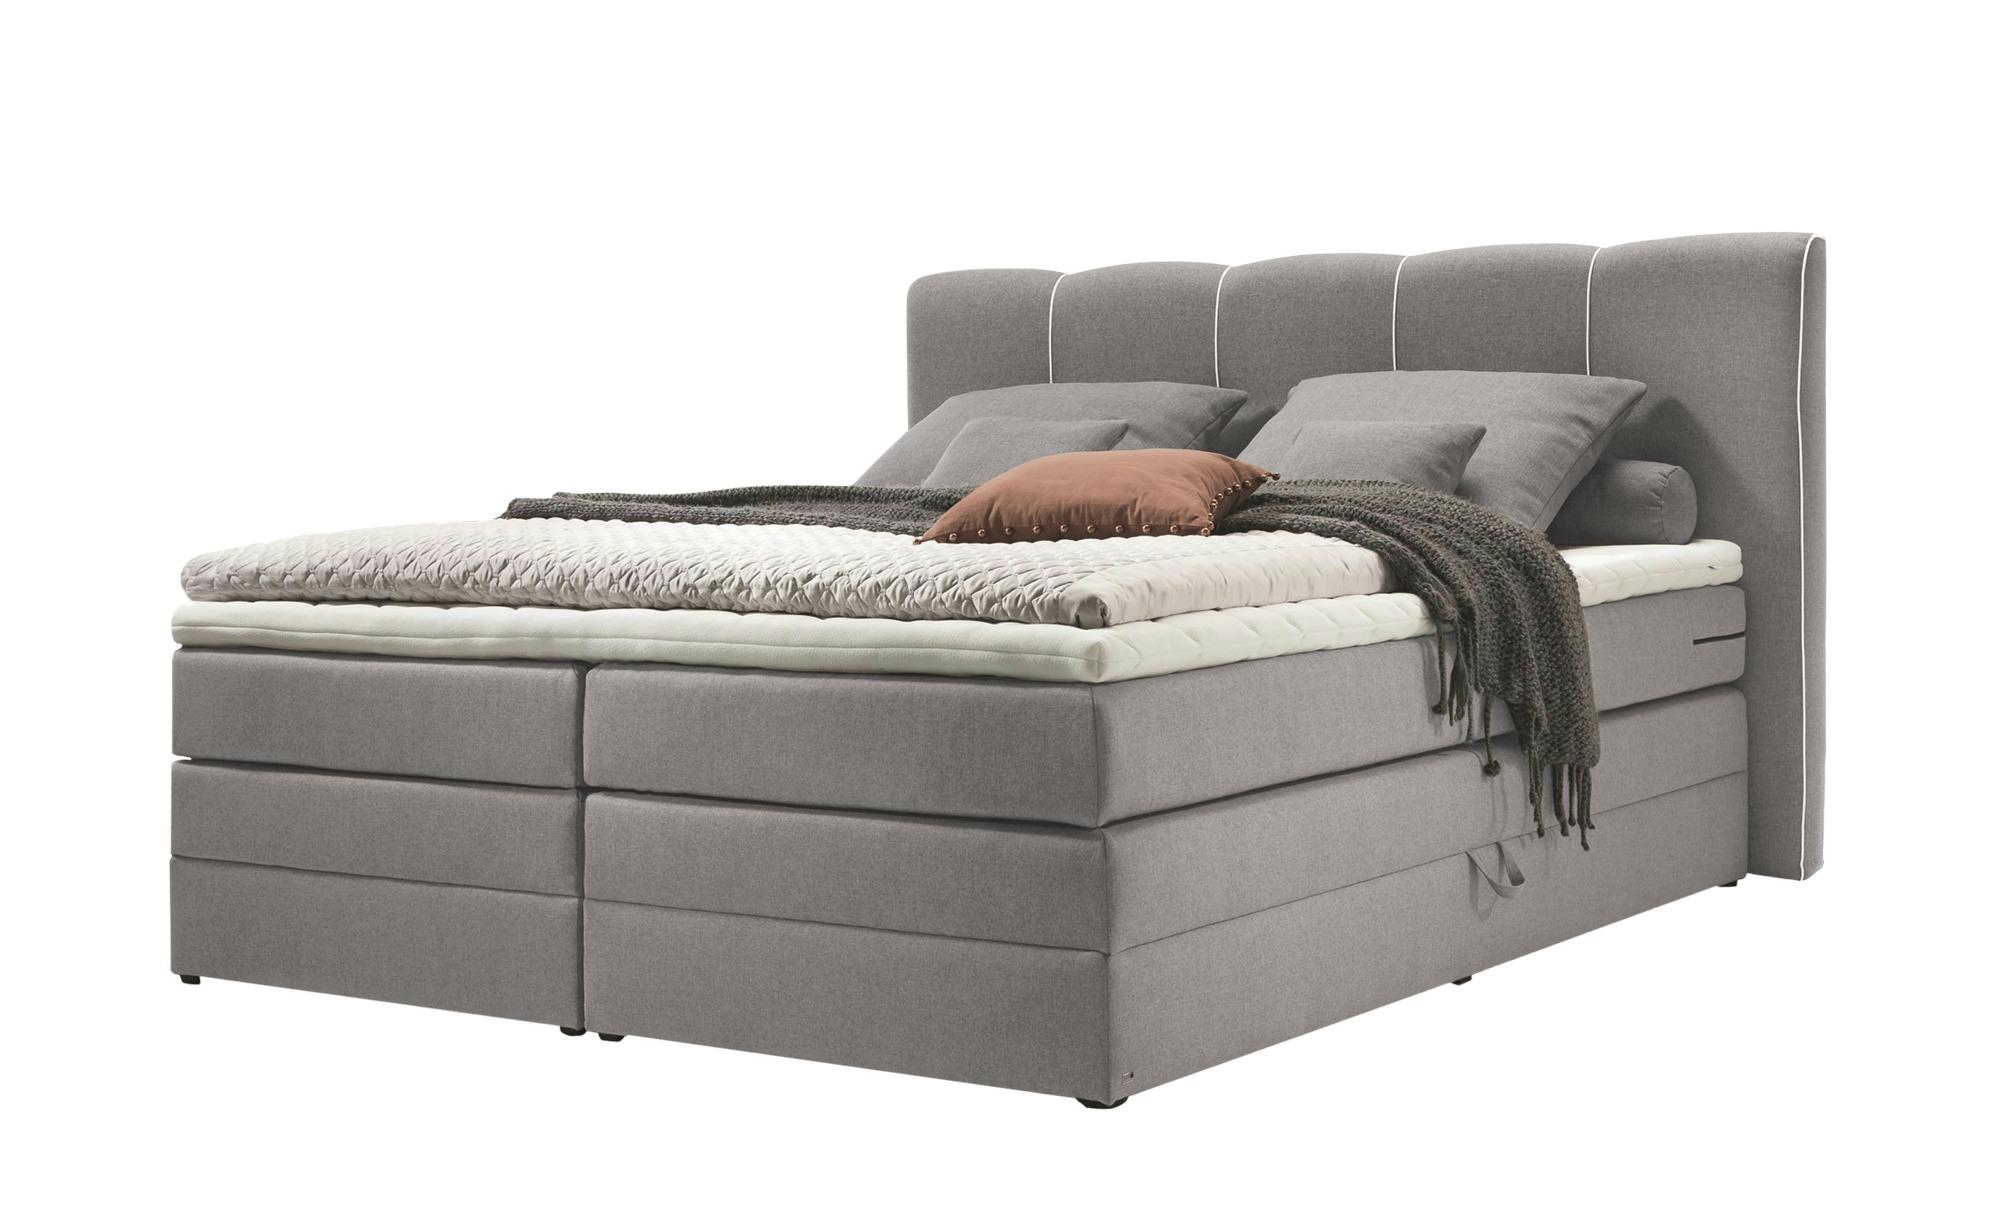 Boxspringbett Musterring 180x200 cm mit Bettkasten